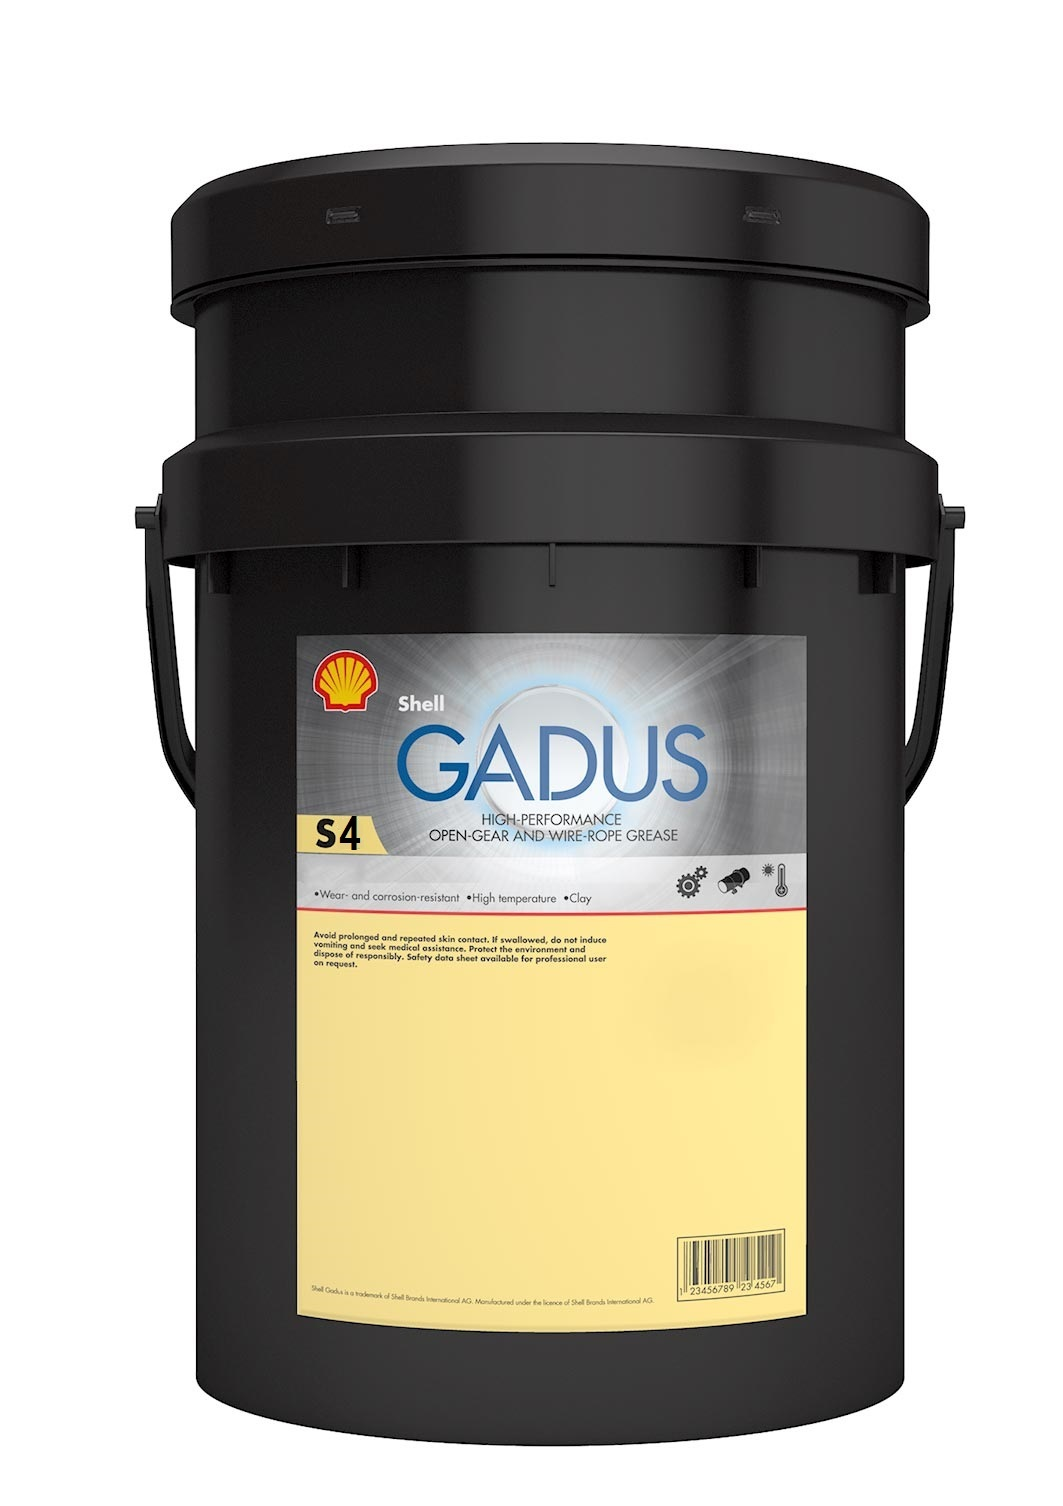 Пластичные Смазки Shell Gadus S4 V45AC 00/00 s4.jpg